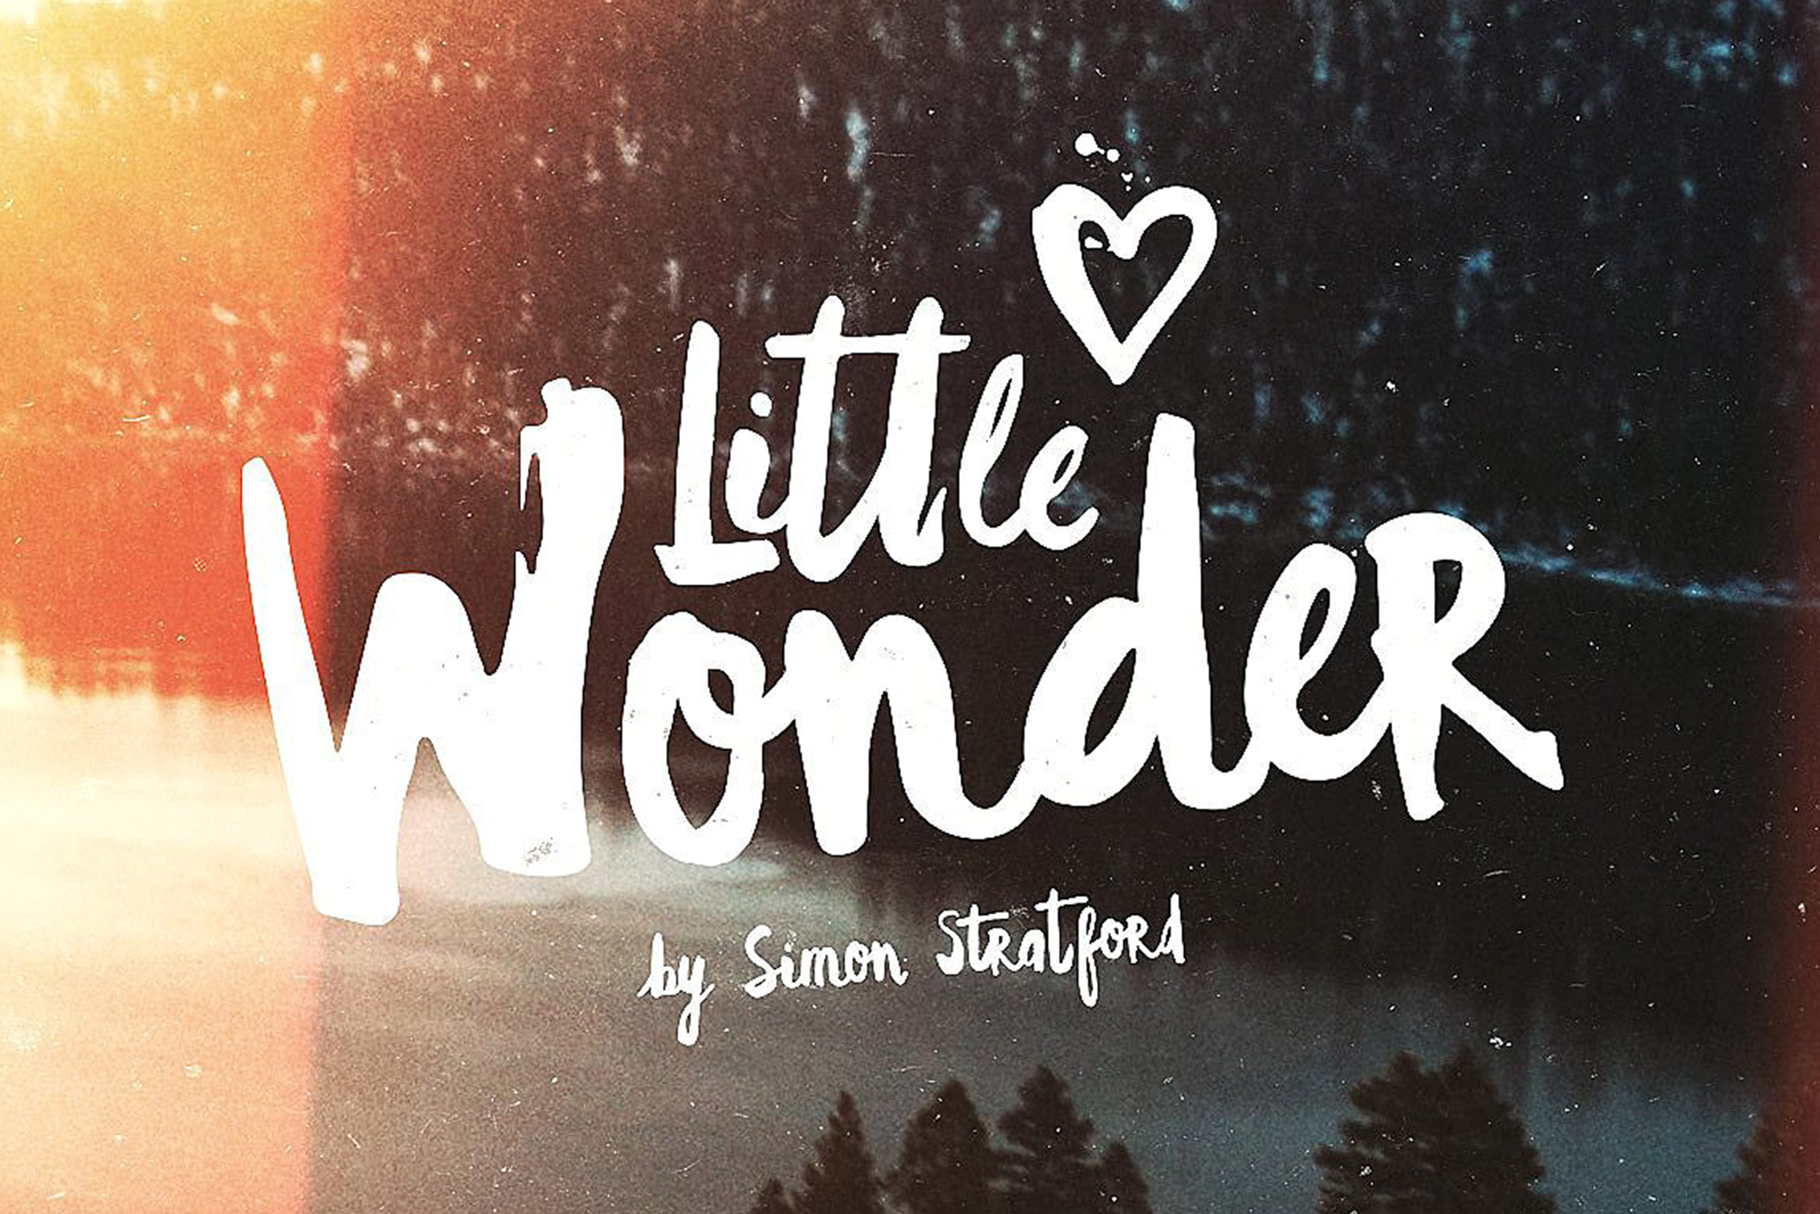 Little Wonder by Simon Stratford